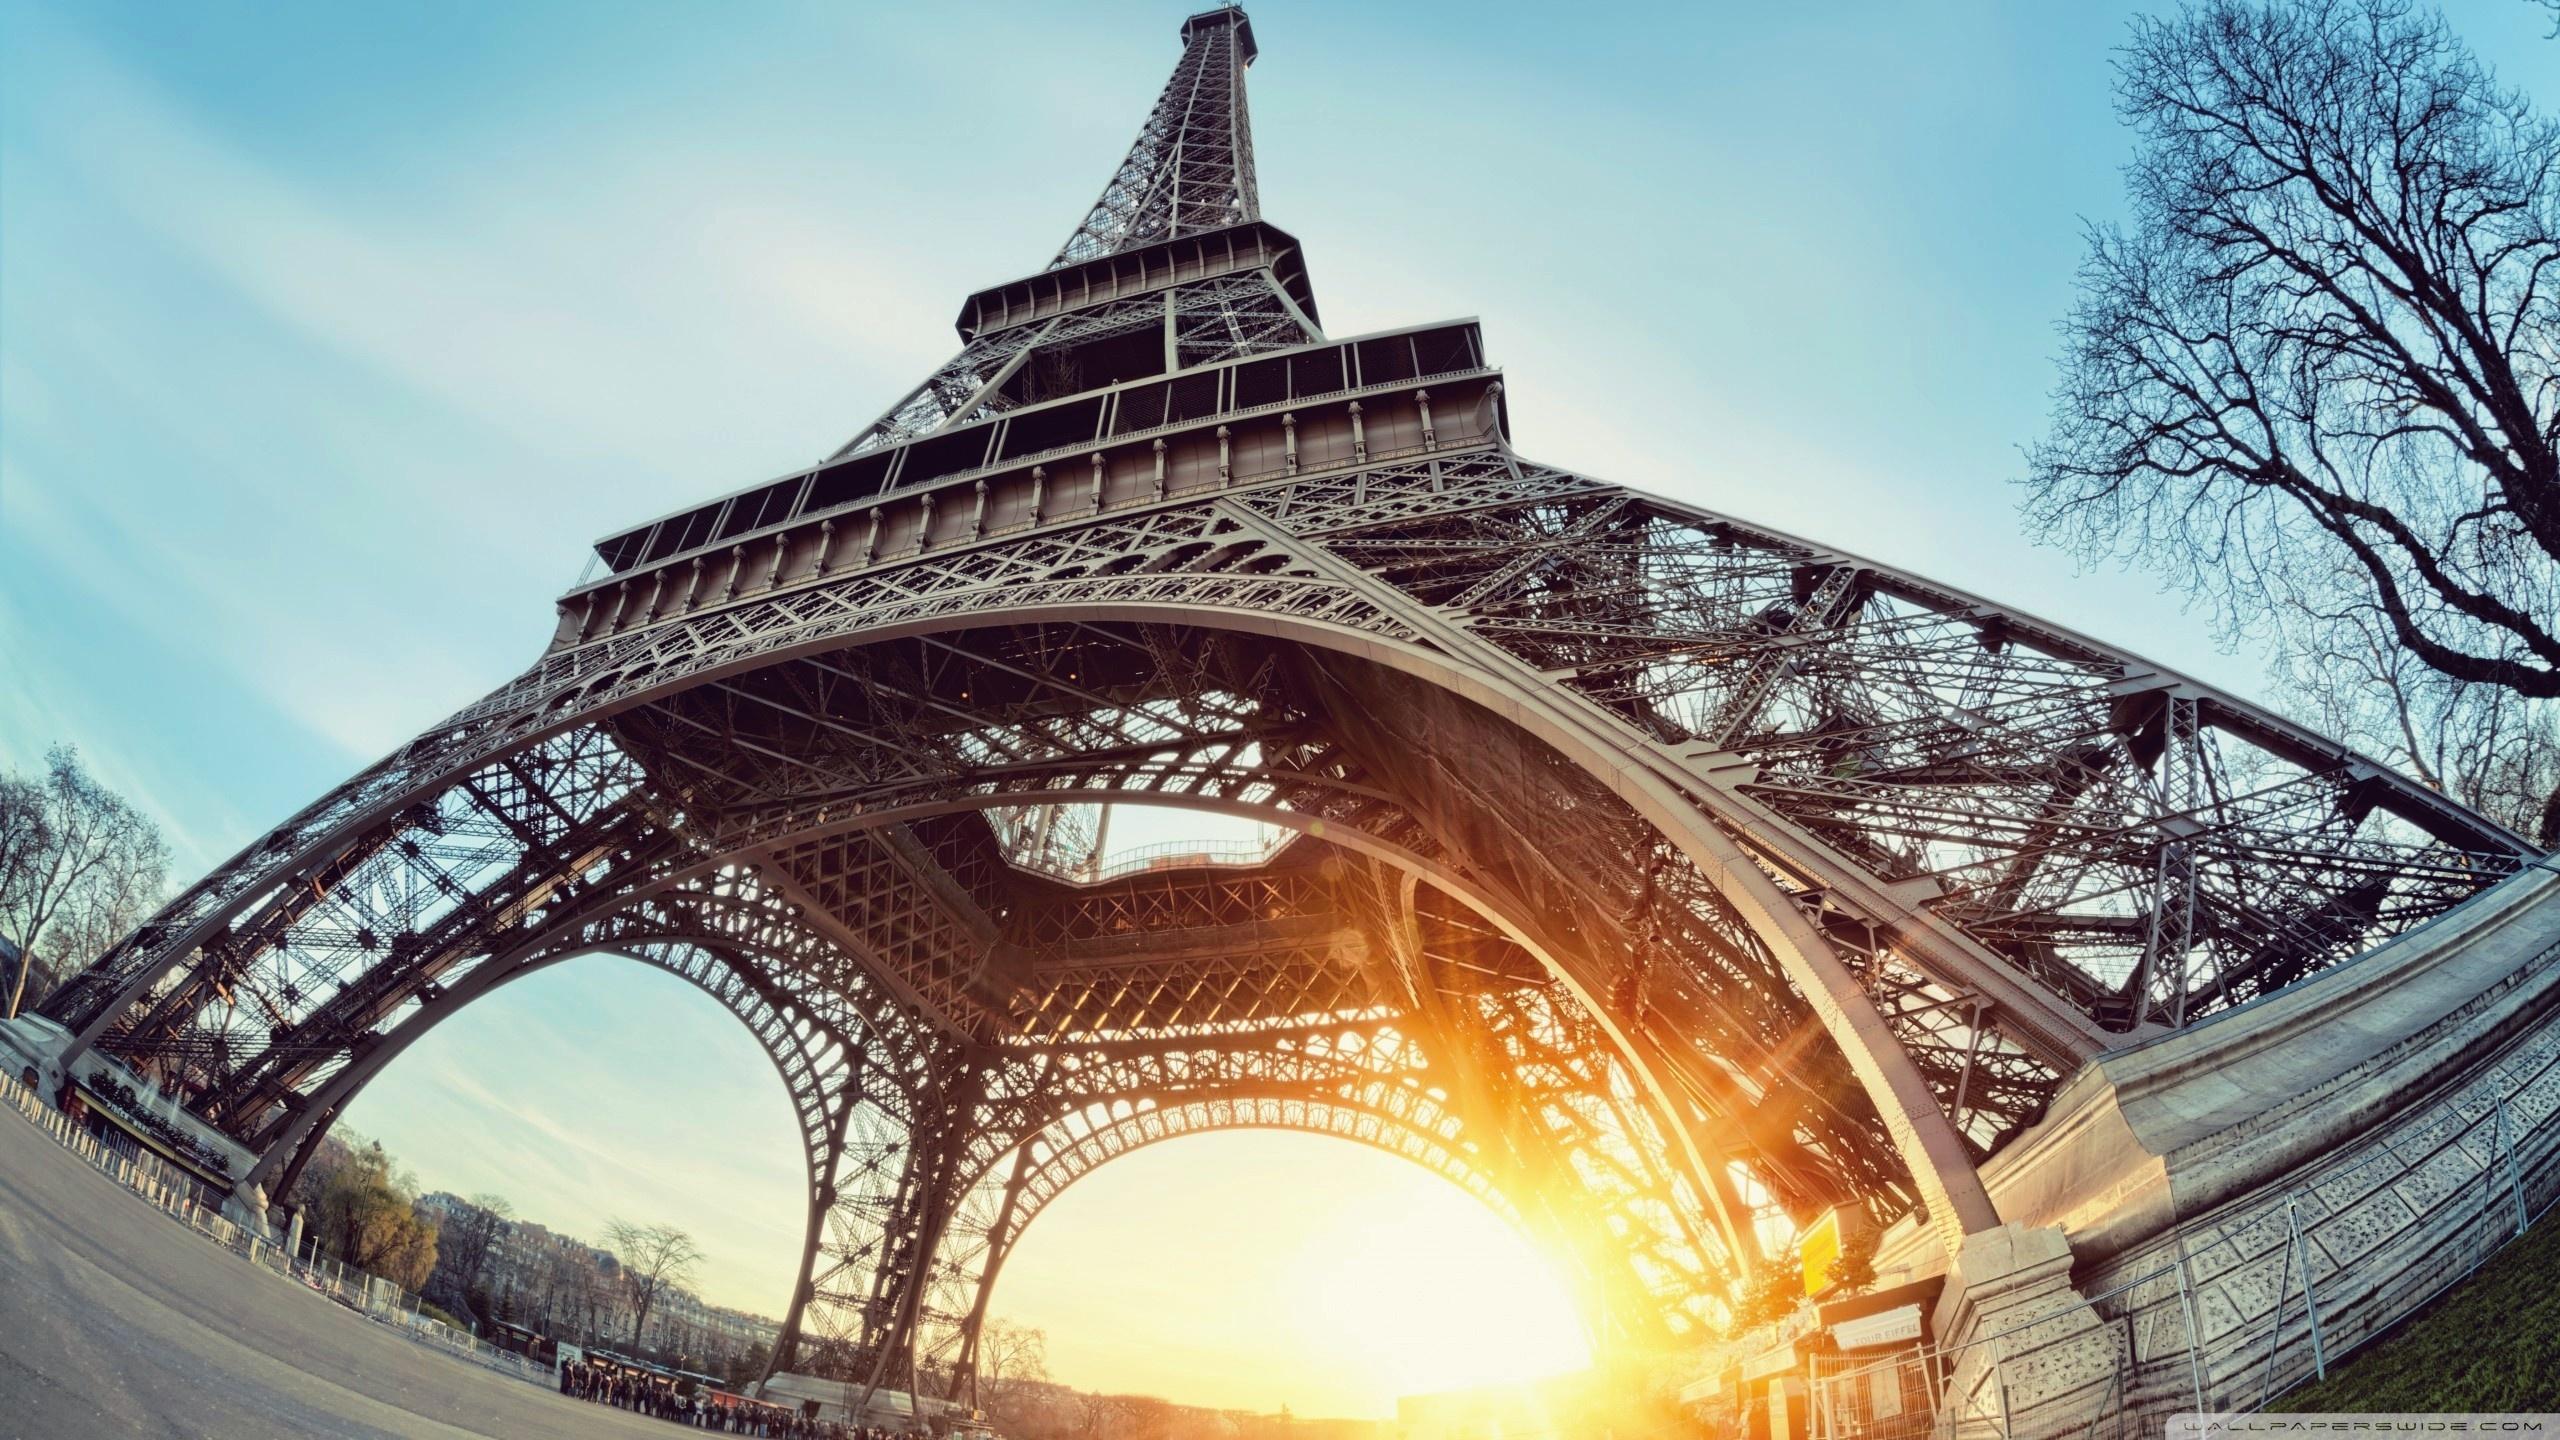 Eiffel Tower High Definition Posted By John Cunningham